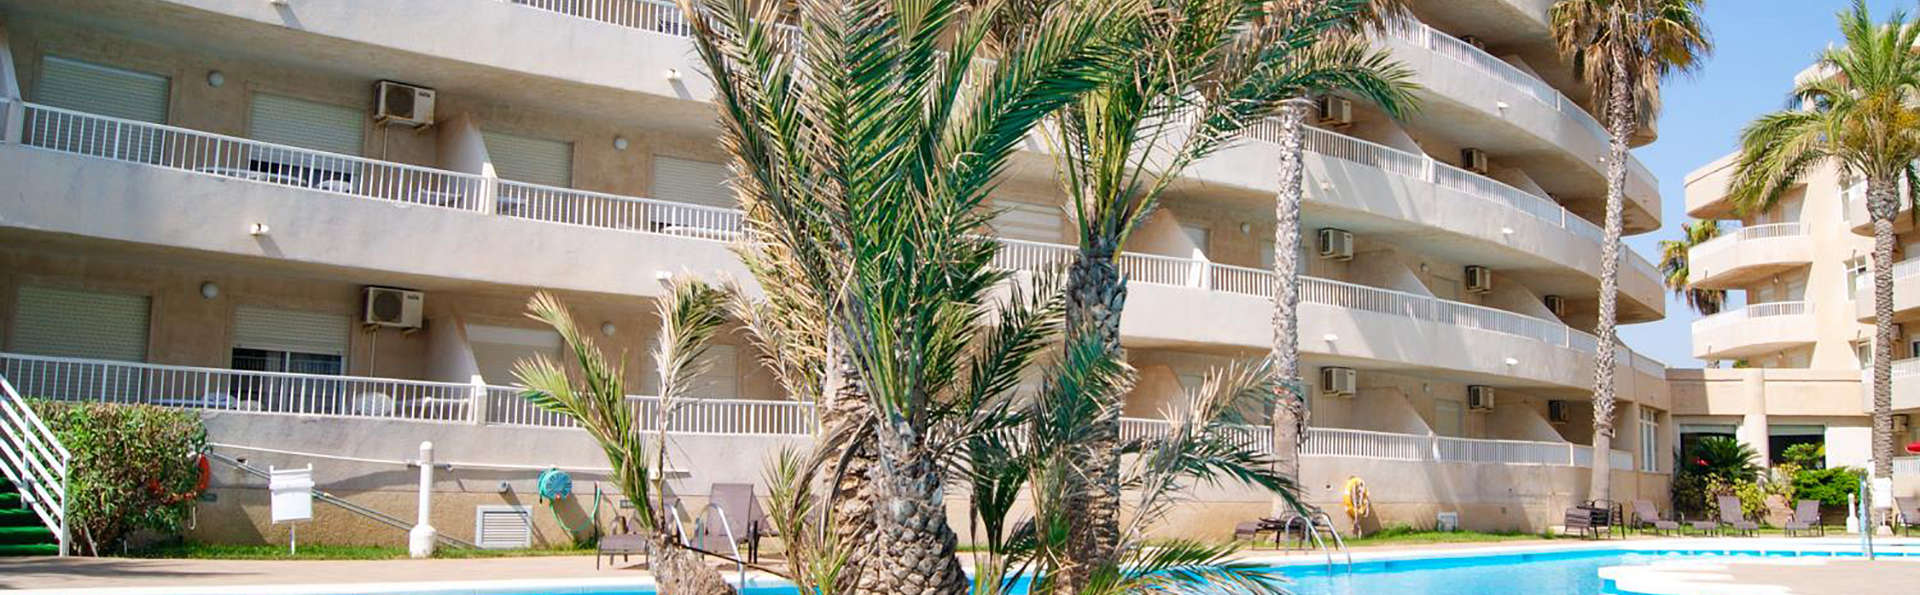 Palmera Beach - edit_front4.jpg